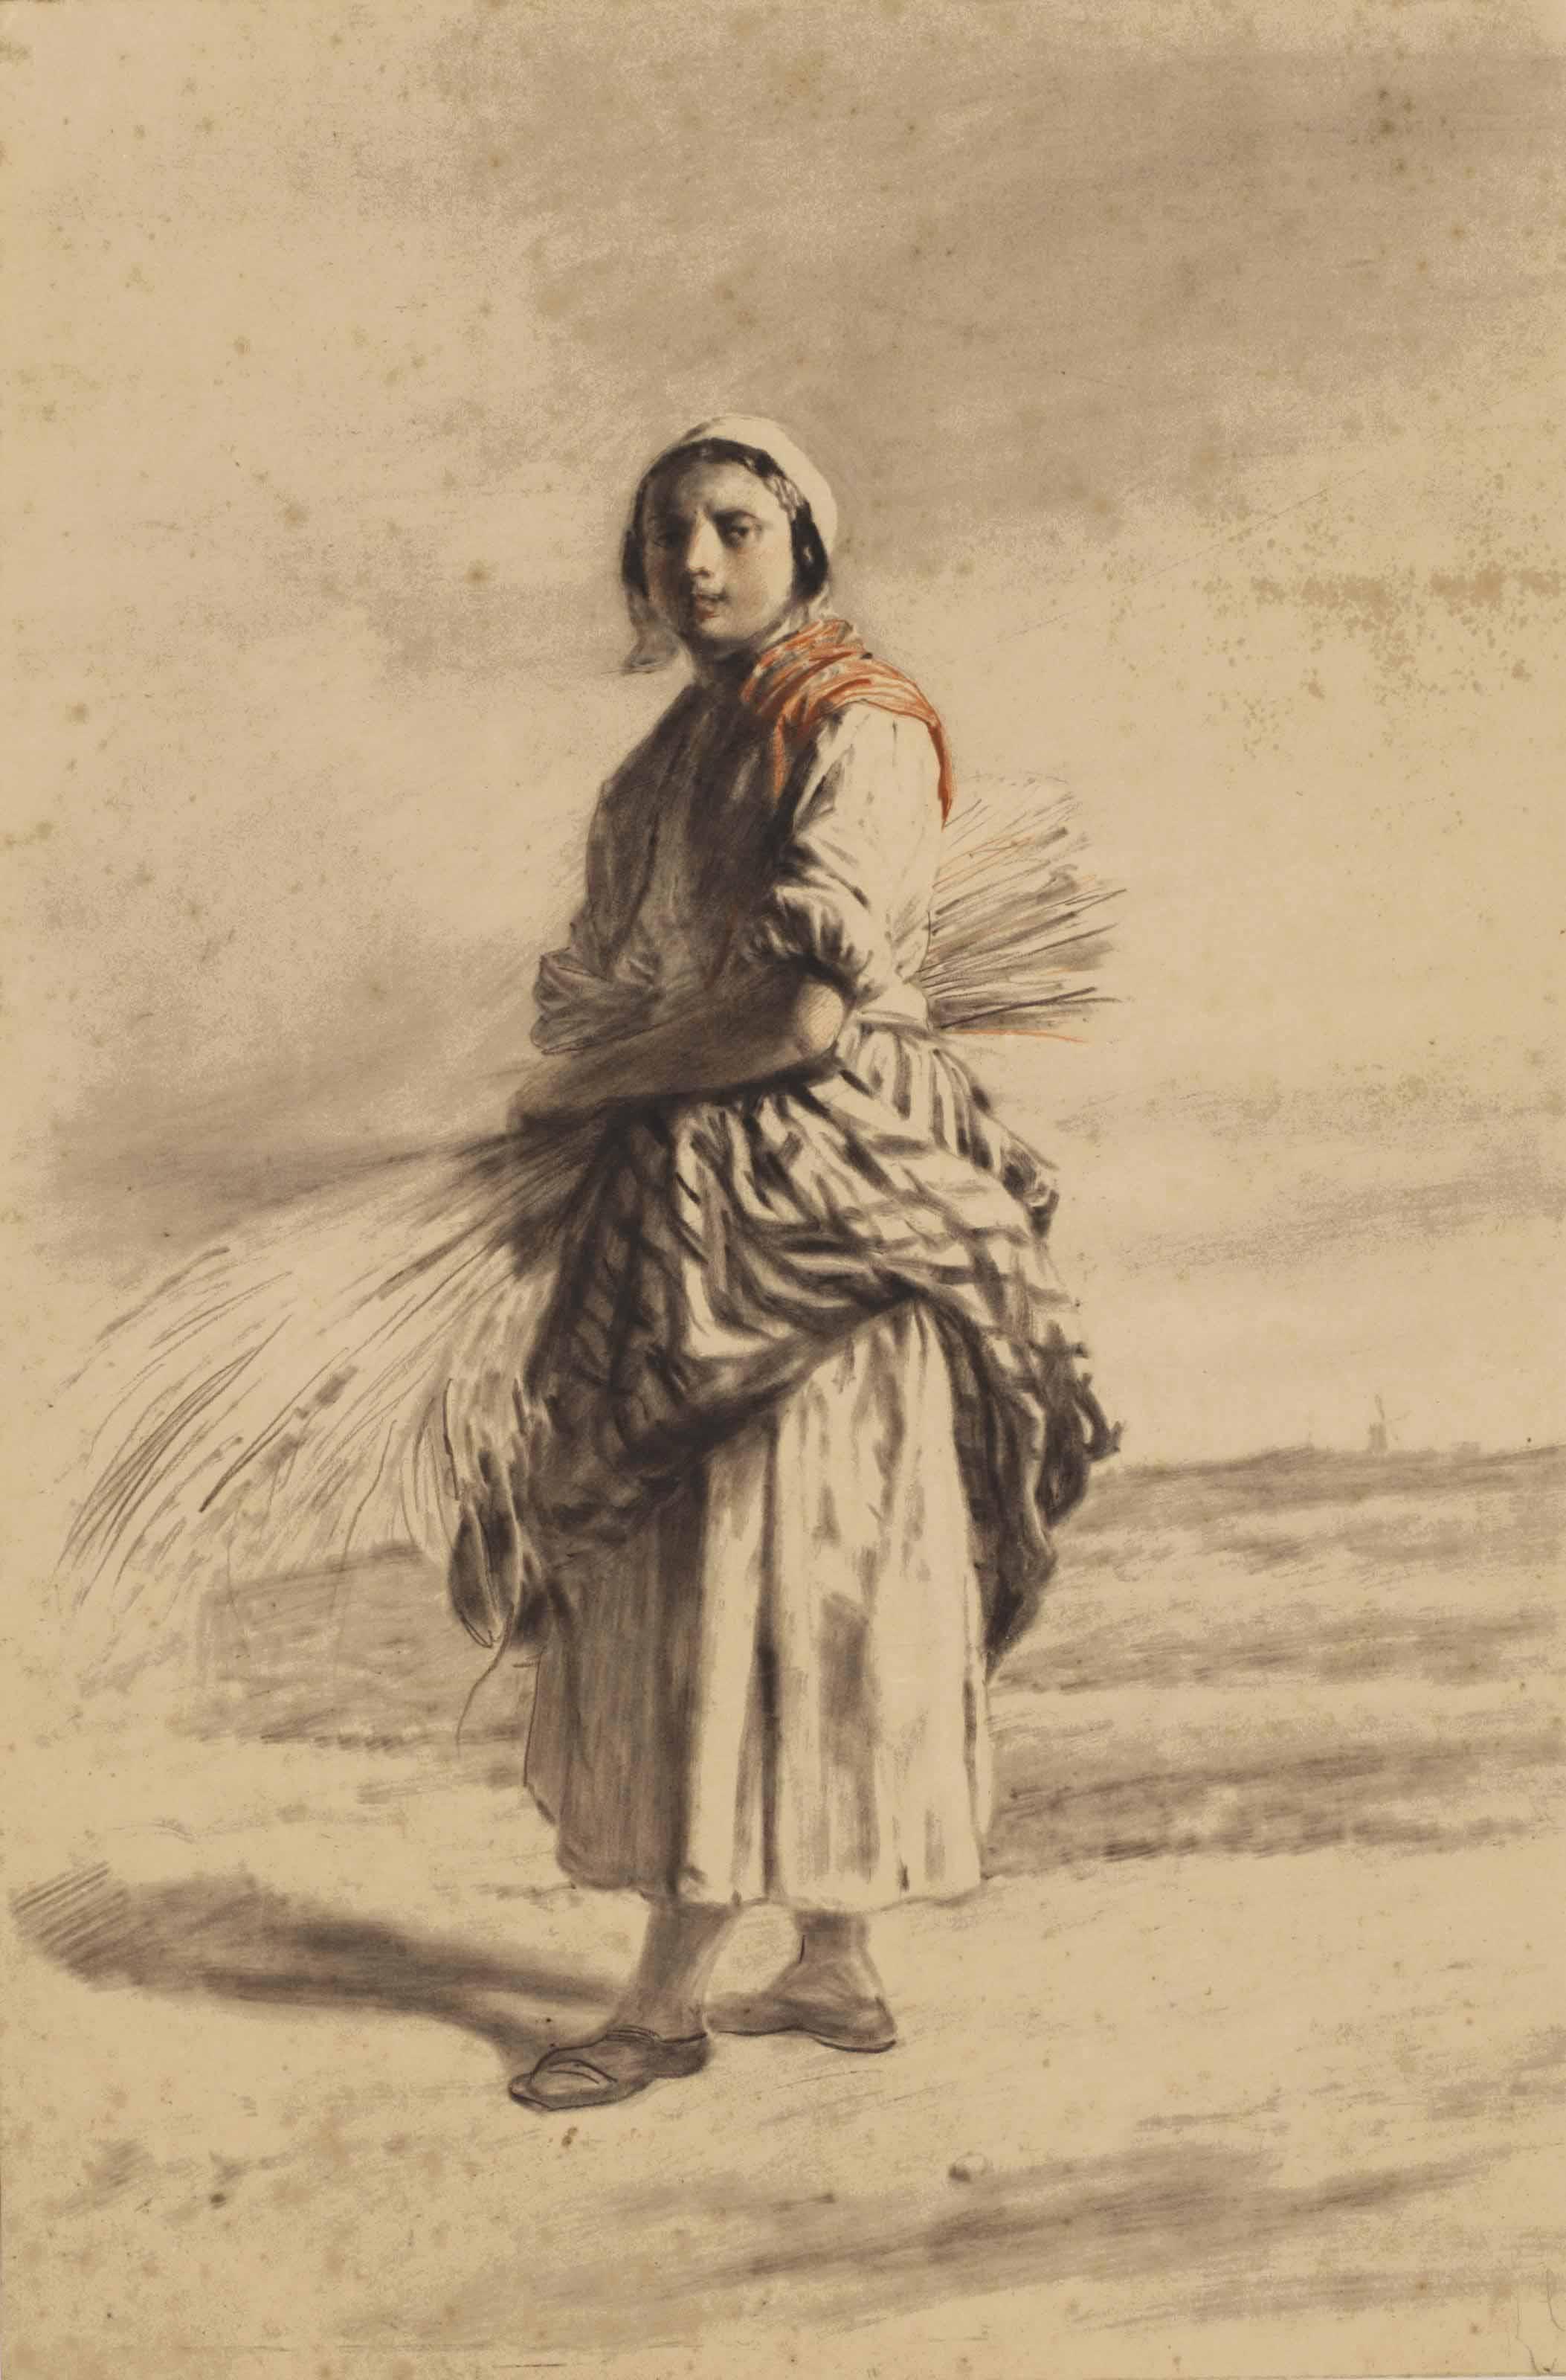 A farmer's wife with a sheaf of corn on a path